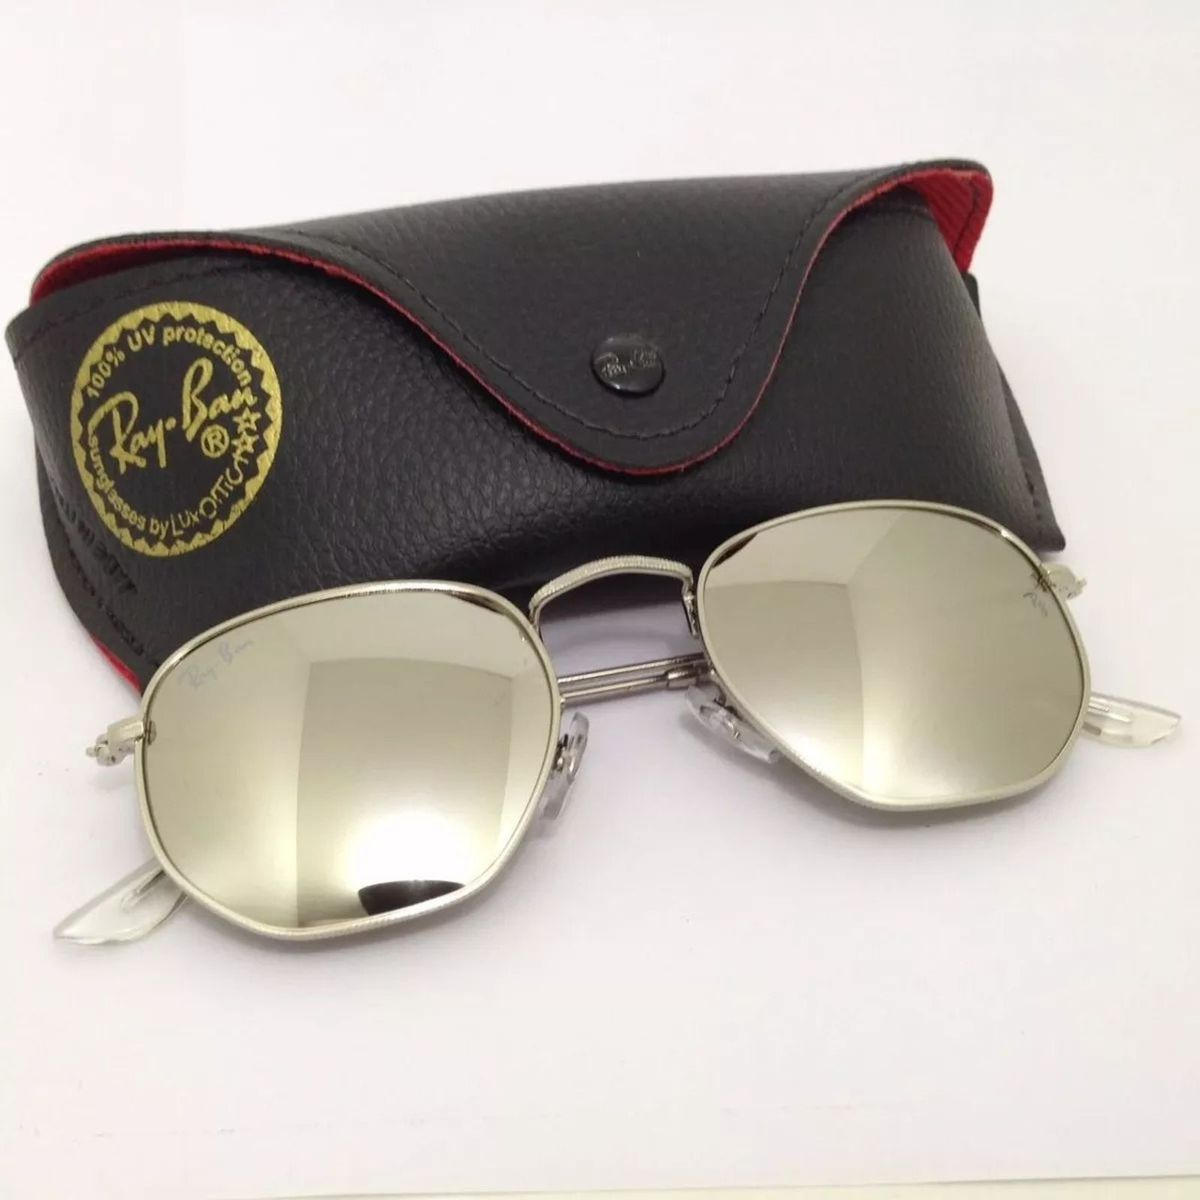 óculos de sol hexagonal ray ban espelhado prata masculino feminino - óculos  sem marca 712ae68293